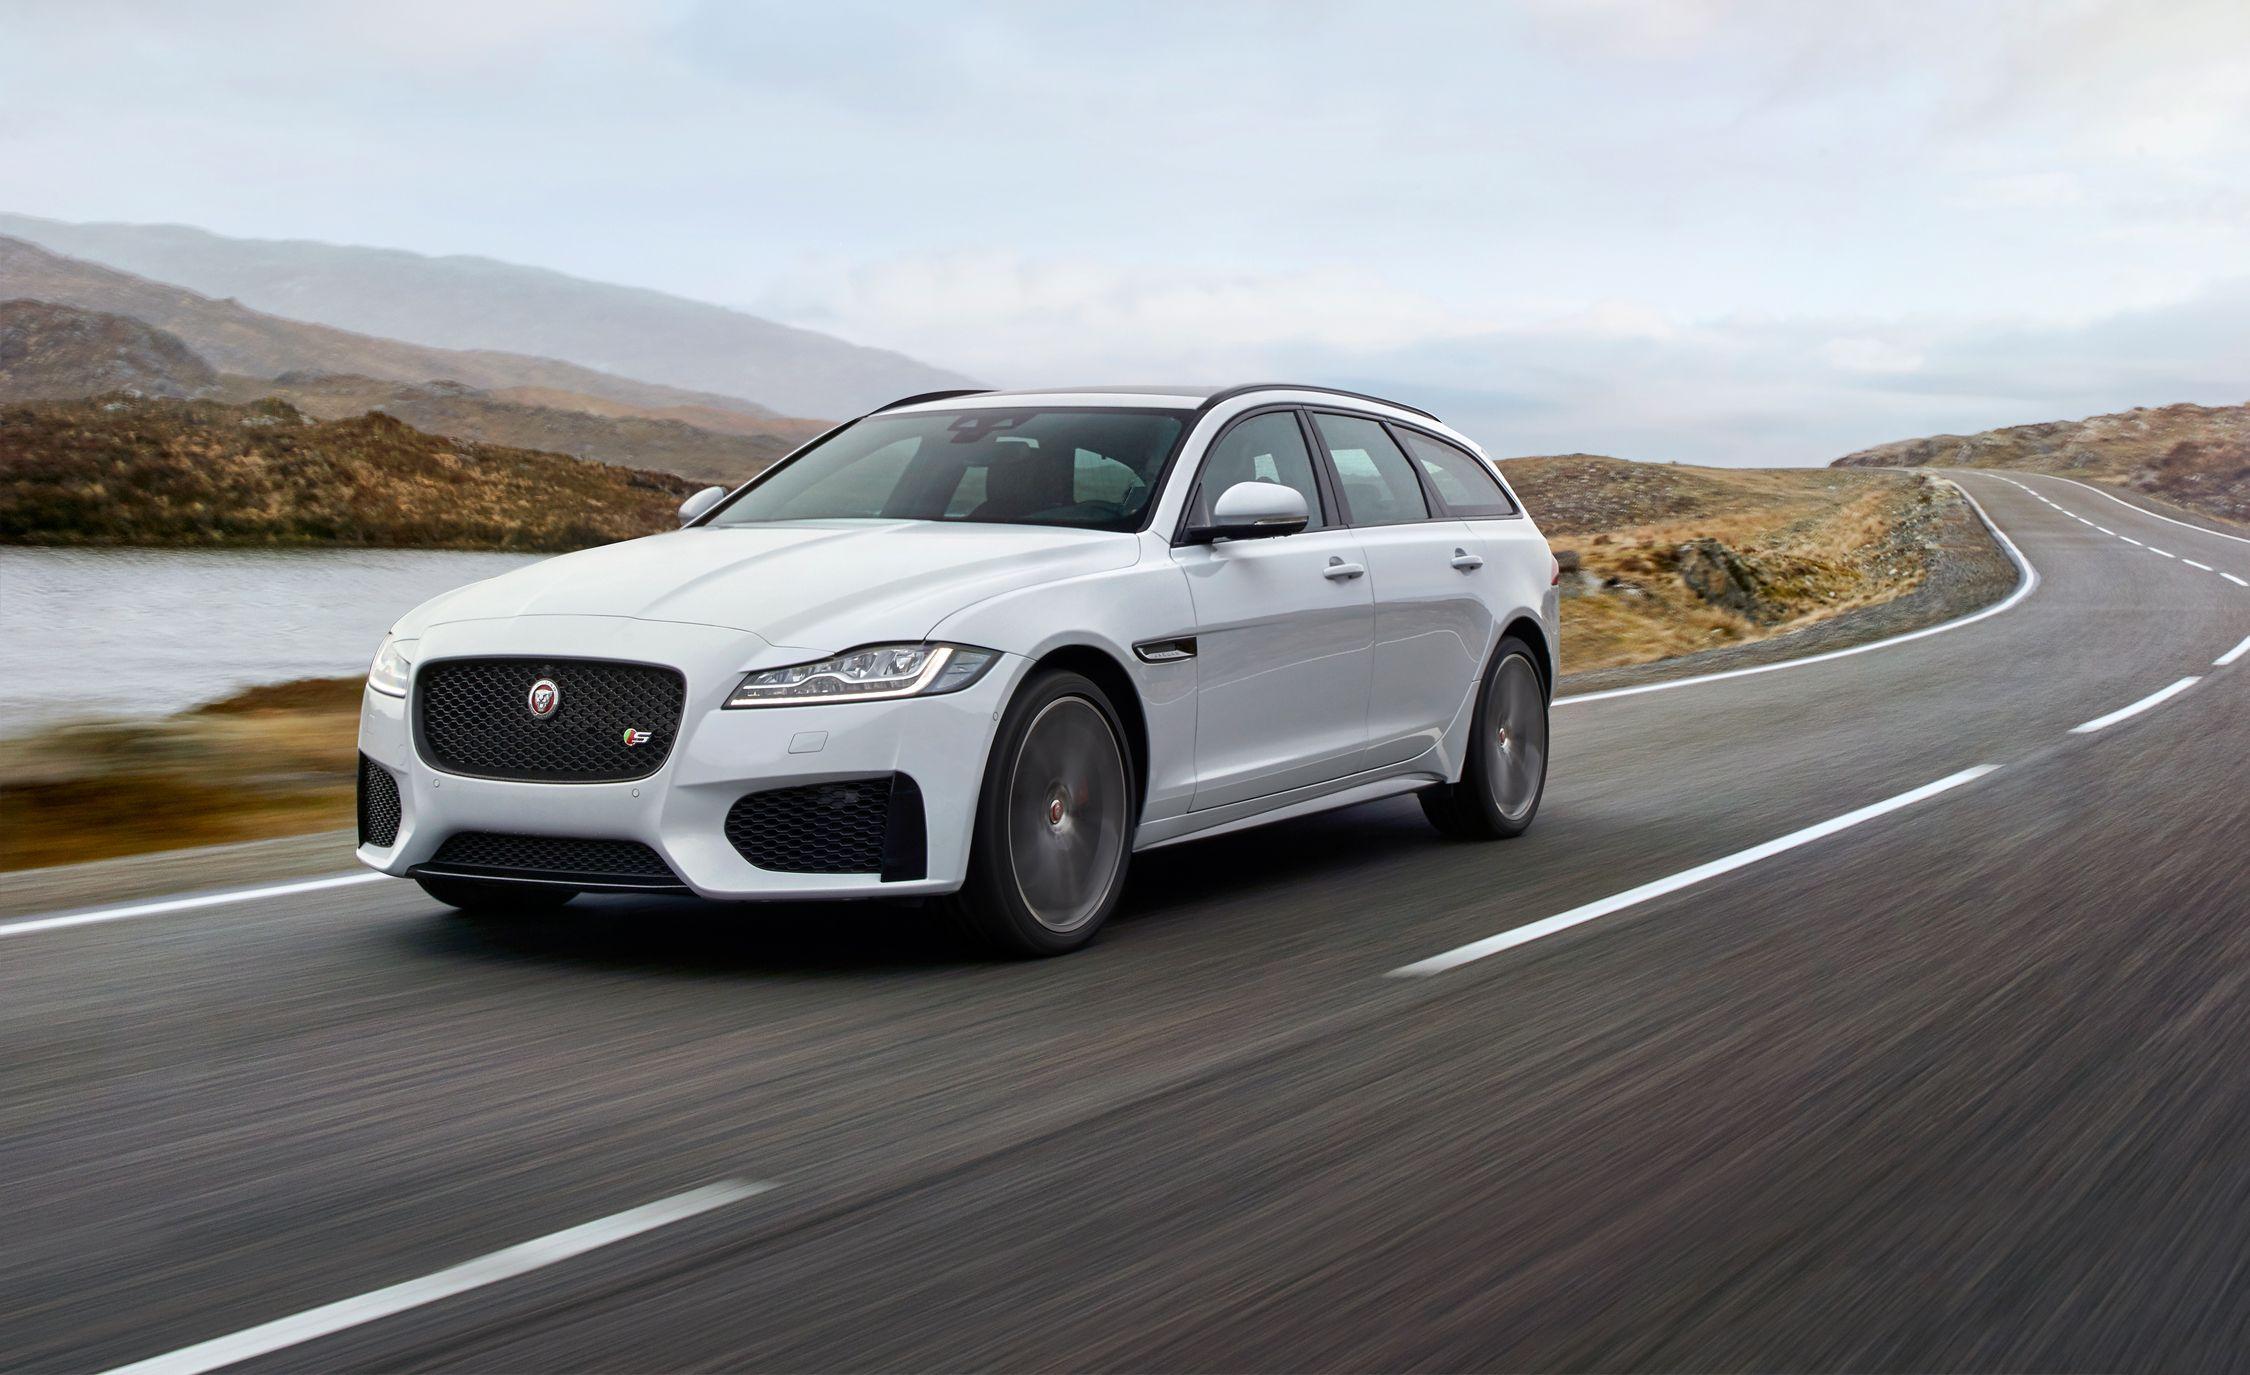 2018 jaguar incentives.  incentives in 2018 jaguar incentives